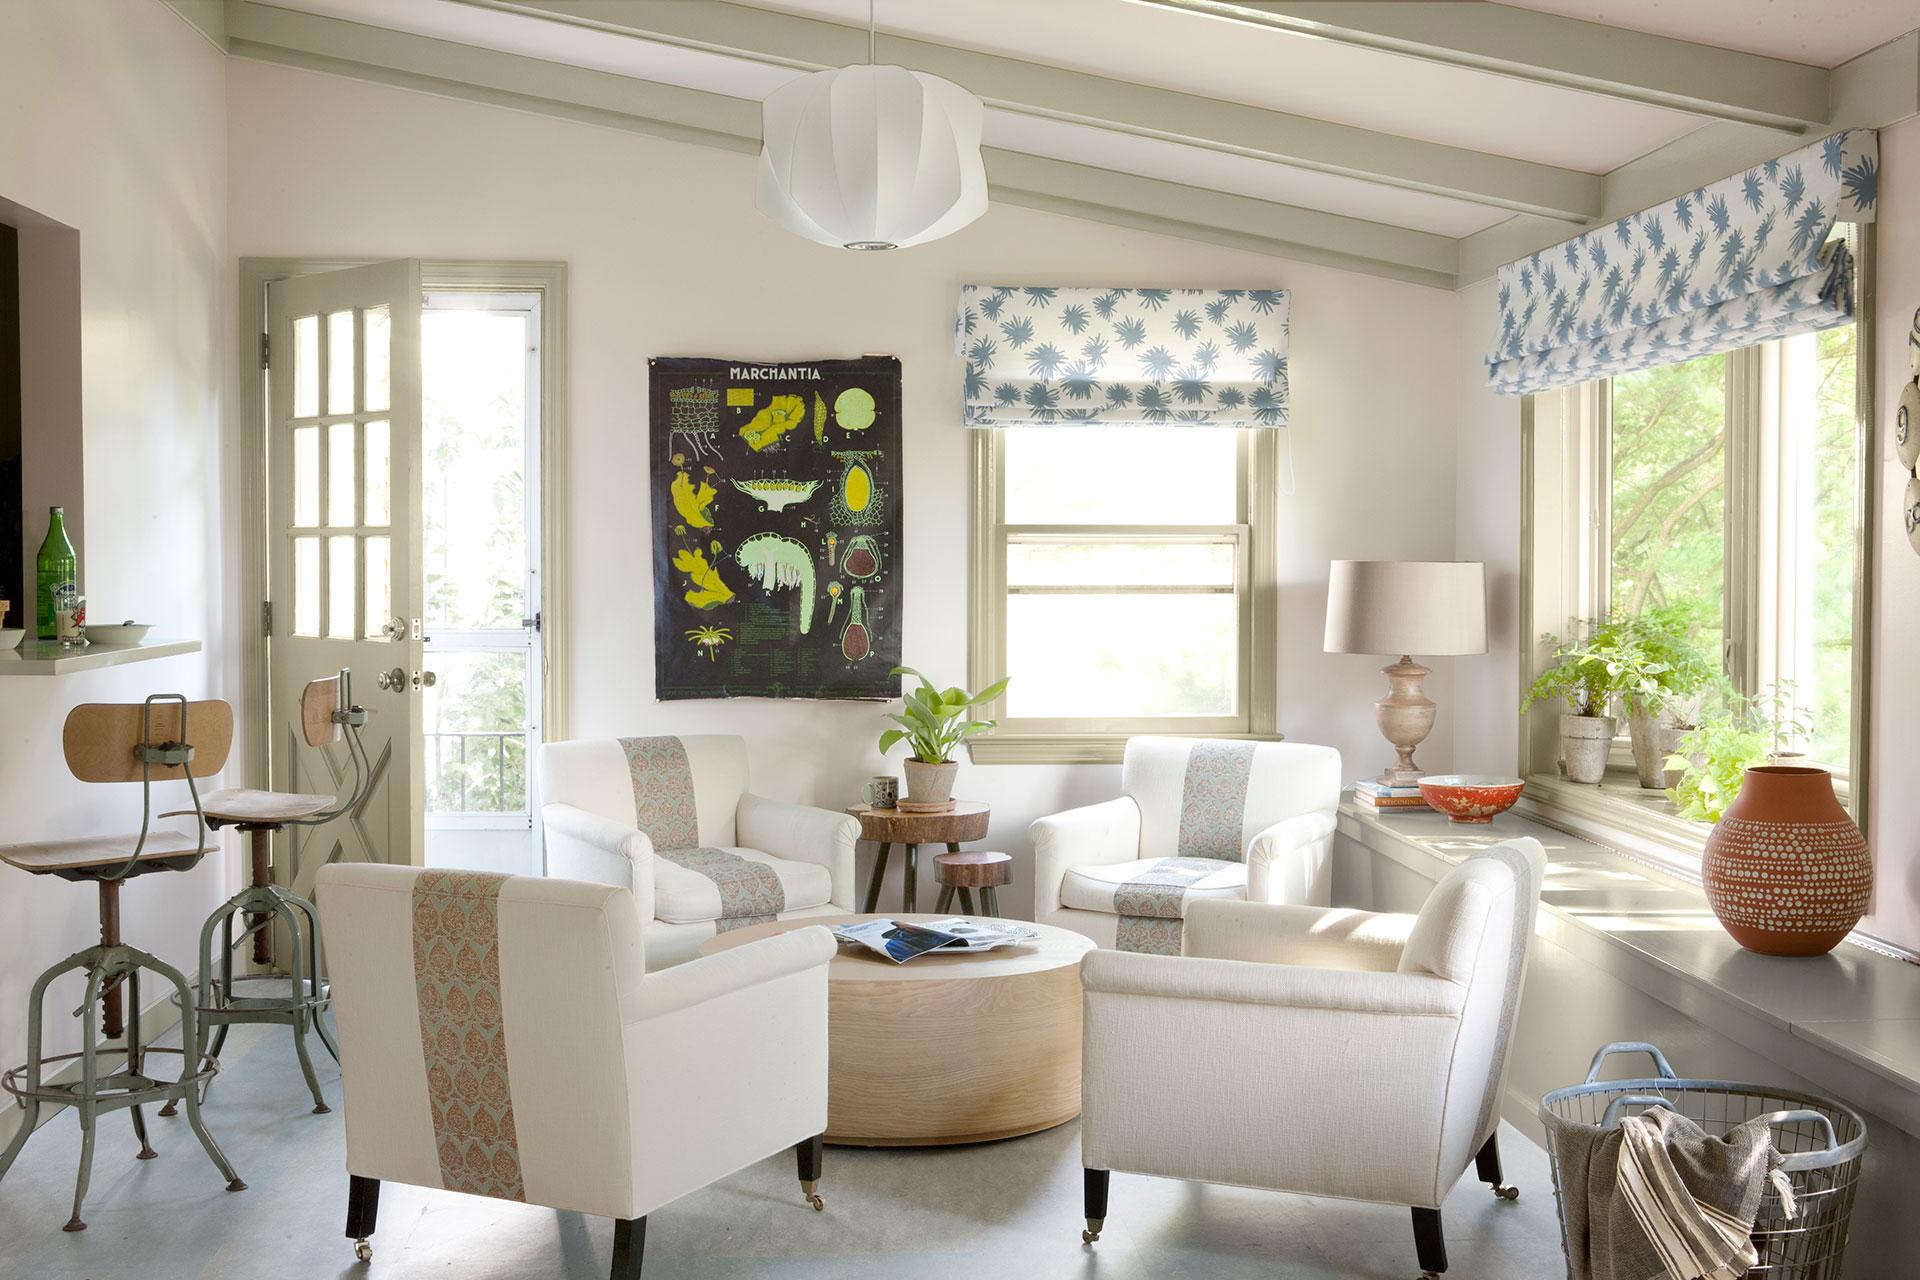 Sara Story Massachusetts - Interior Designer Decorating Ideas